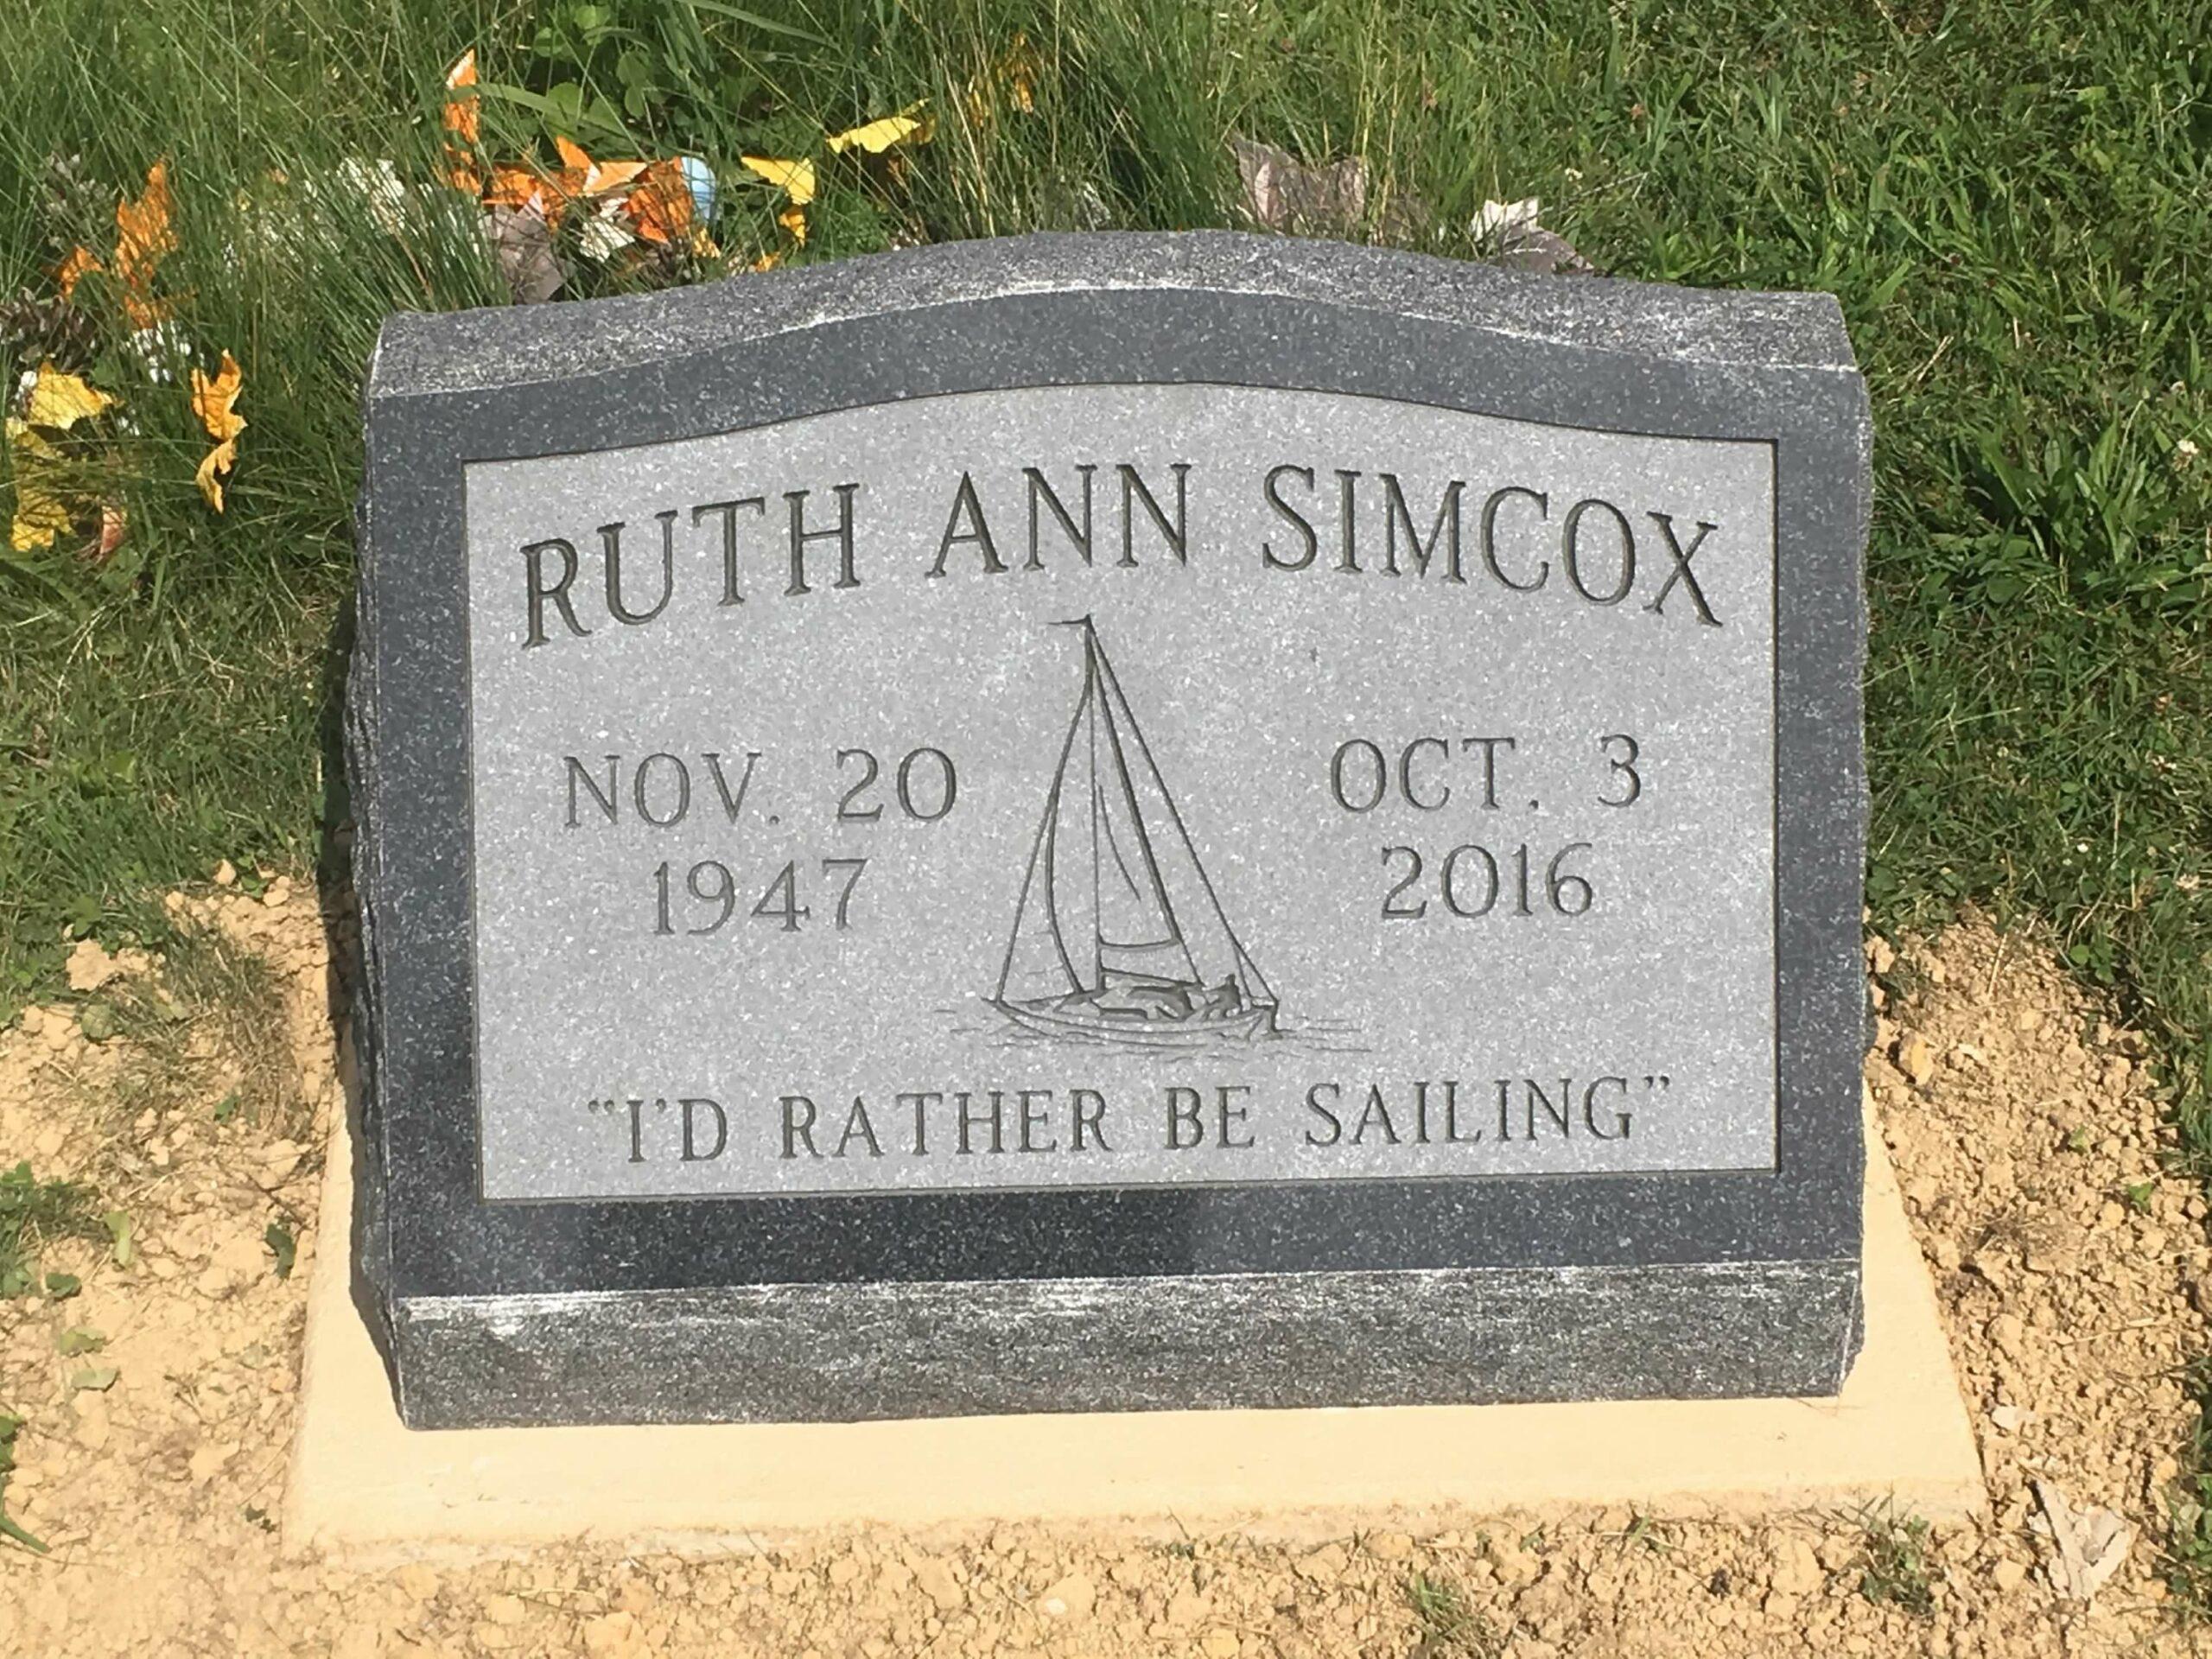 Simcox, Ruth Ann - Mt. Herman Cem., 2-0, Amer. Black